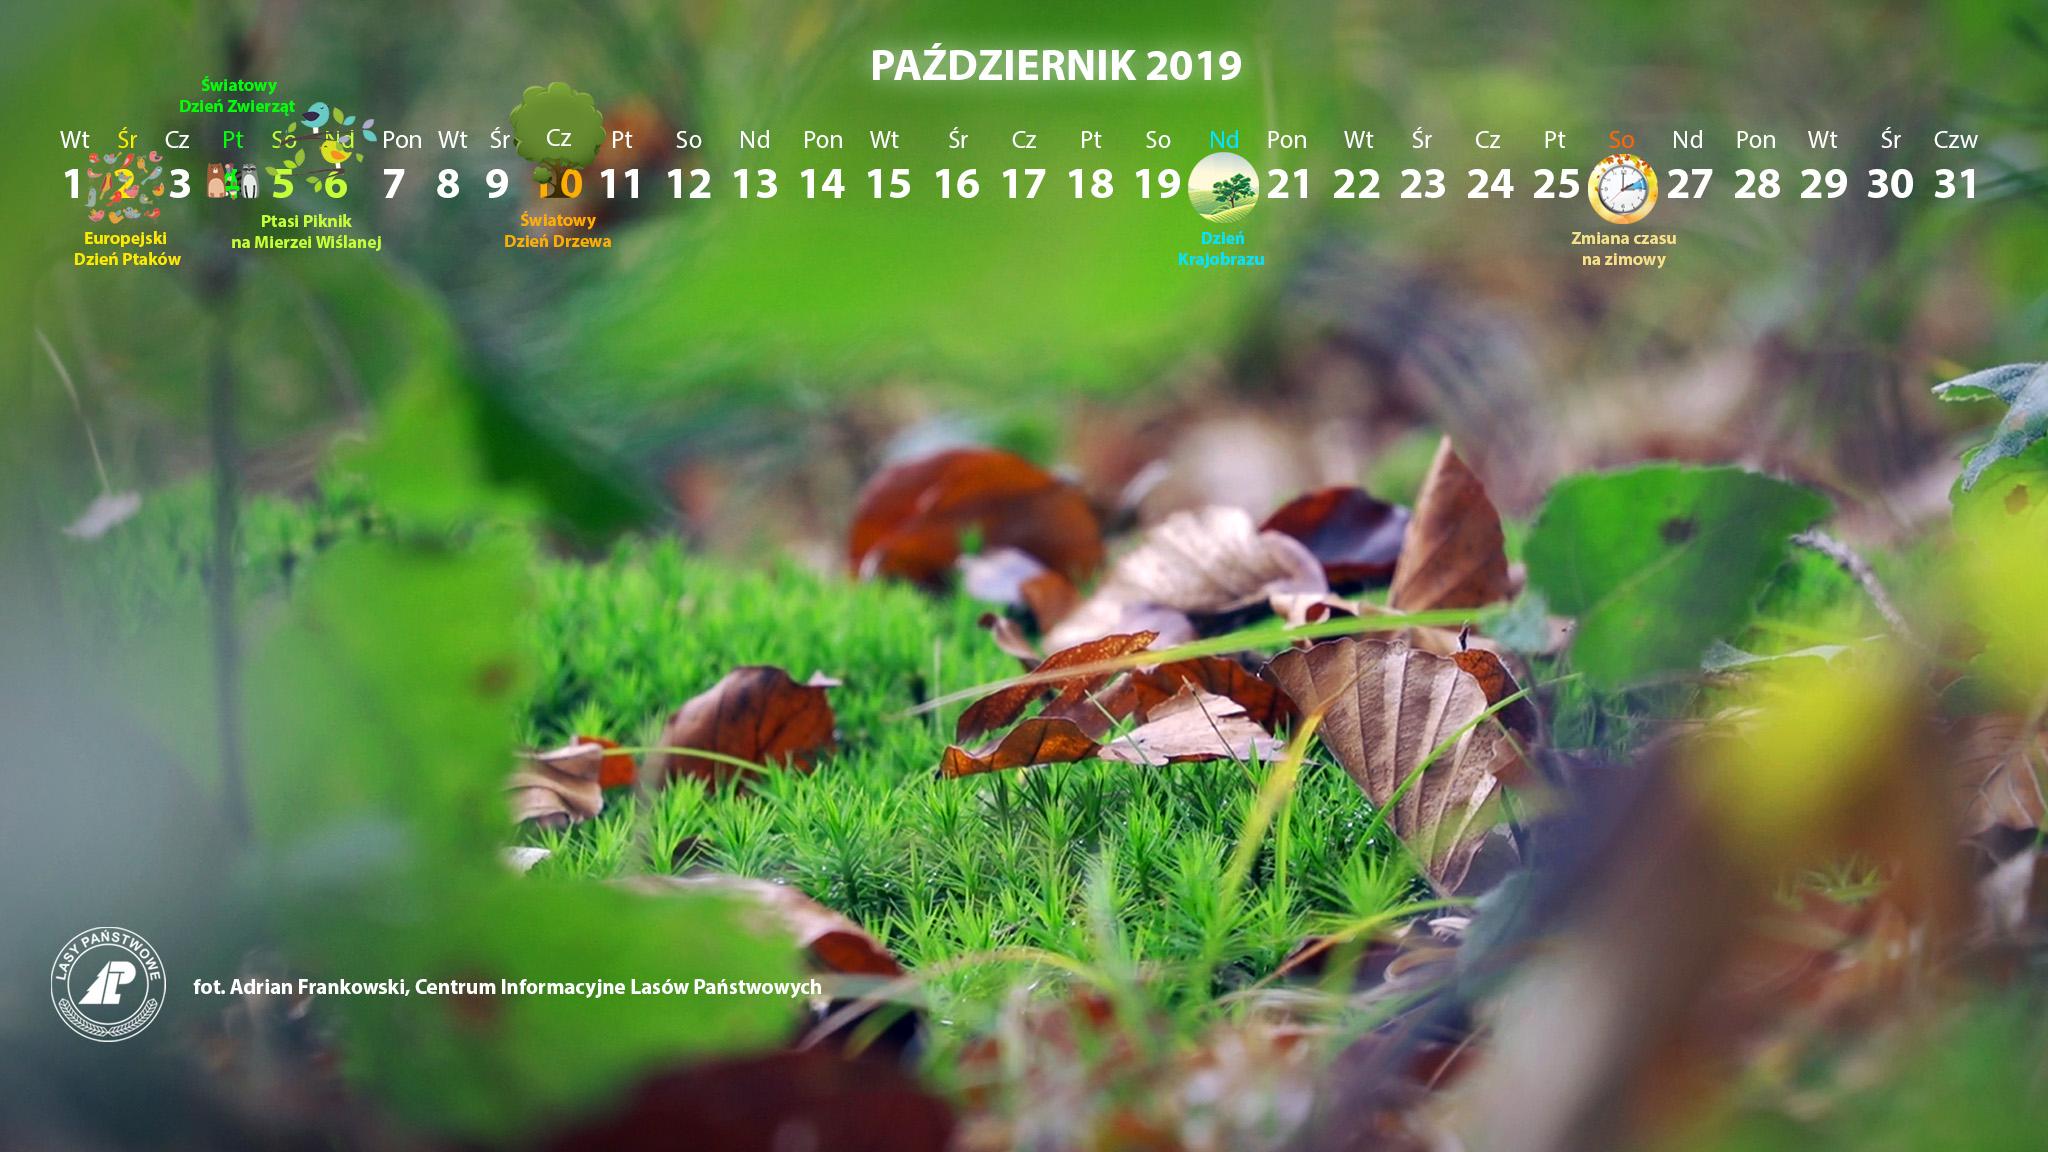 Kalendarz_październik_2019_2048x1152[1].jpg